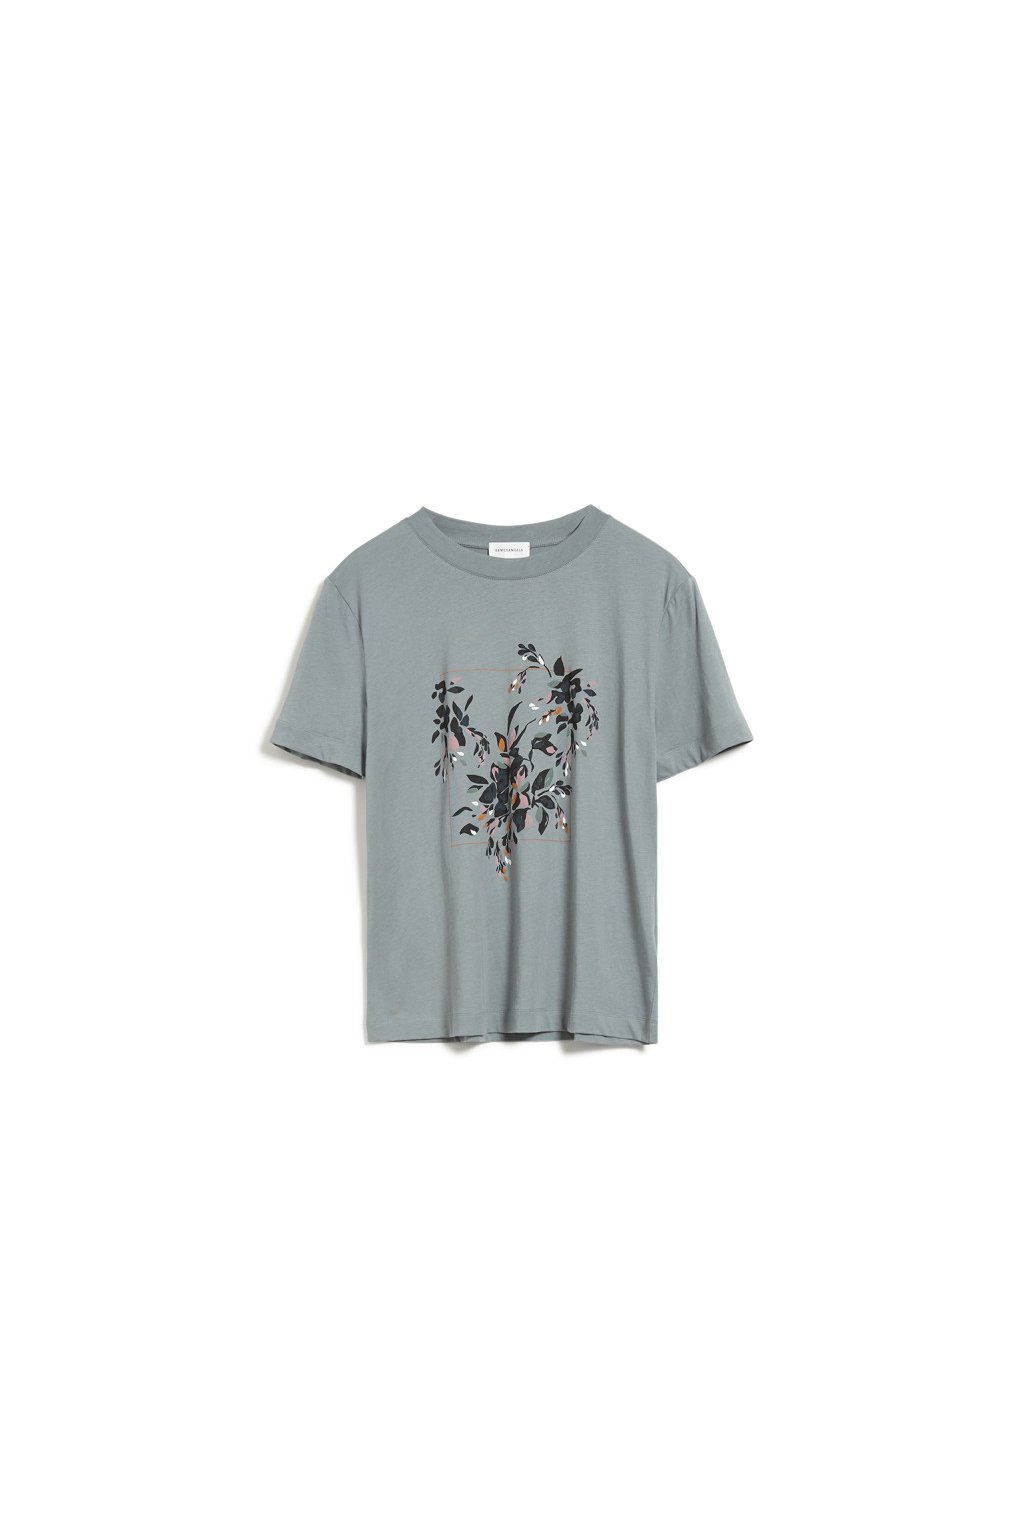 "Dámské zelené tričko z biobavlny ""MIAA floral frame"" (Velikost L)"